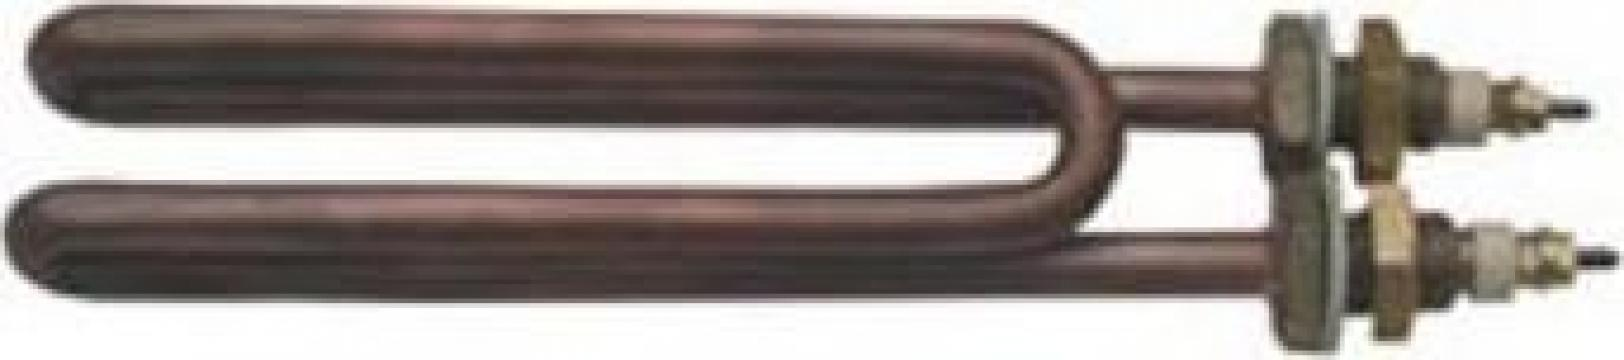 "Rezistenta Stirovap, L=160mm, putere 2200W, filet 1/4"" de la Sercotex International Srl"